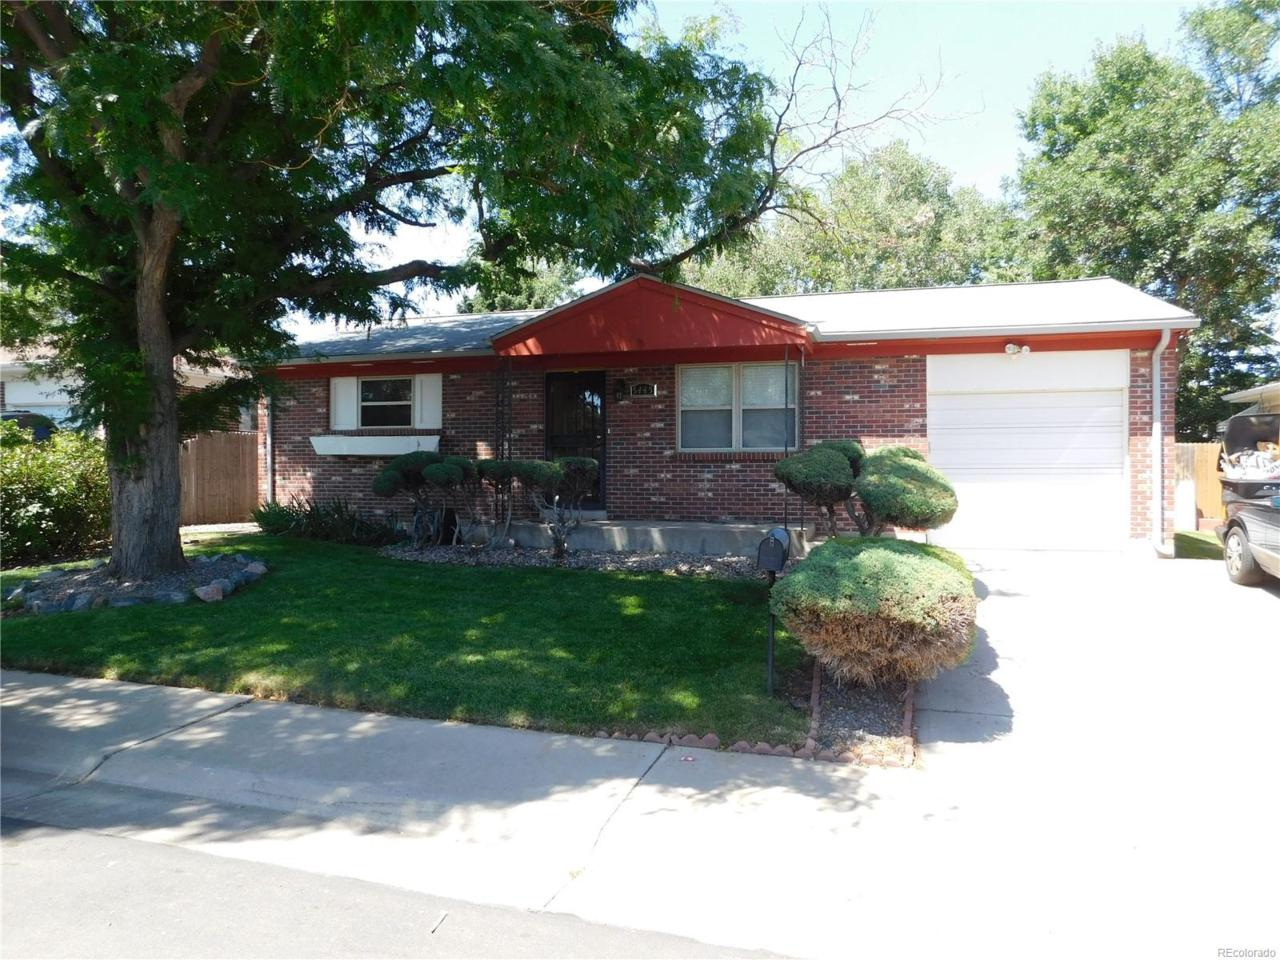 5445 Quentin Street, Denver, CO 80239 (MLS #5944072) :: 8z Real Estate